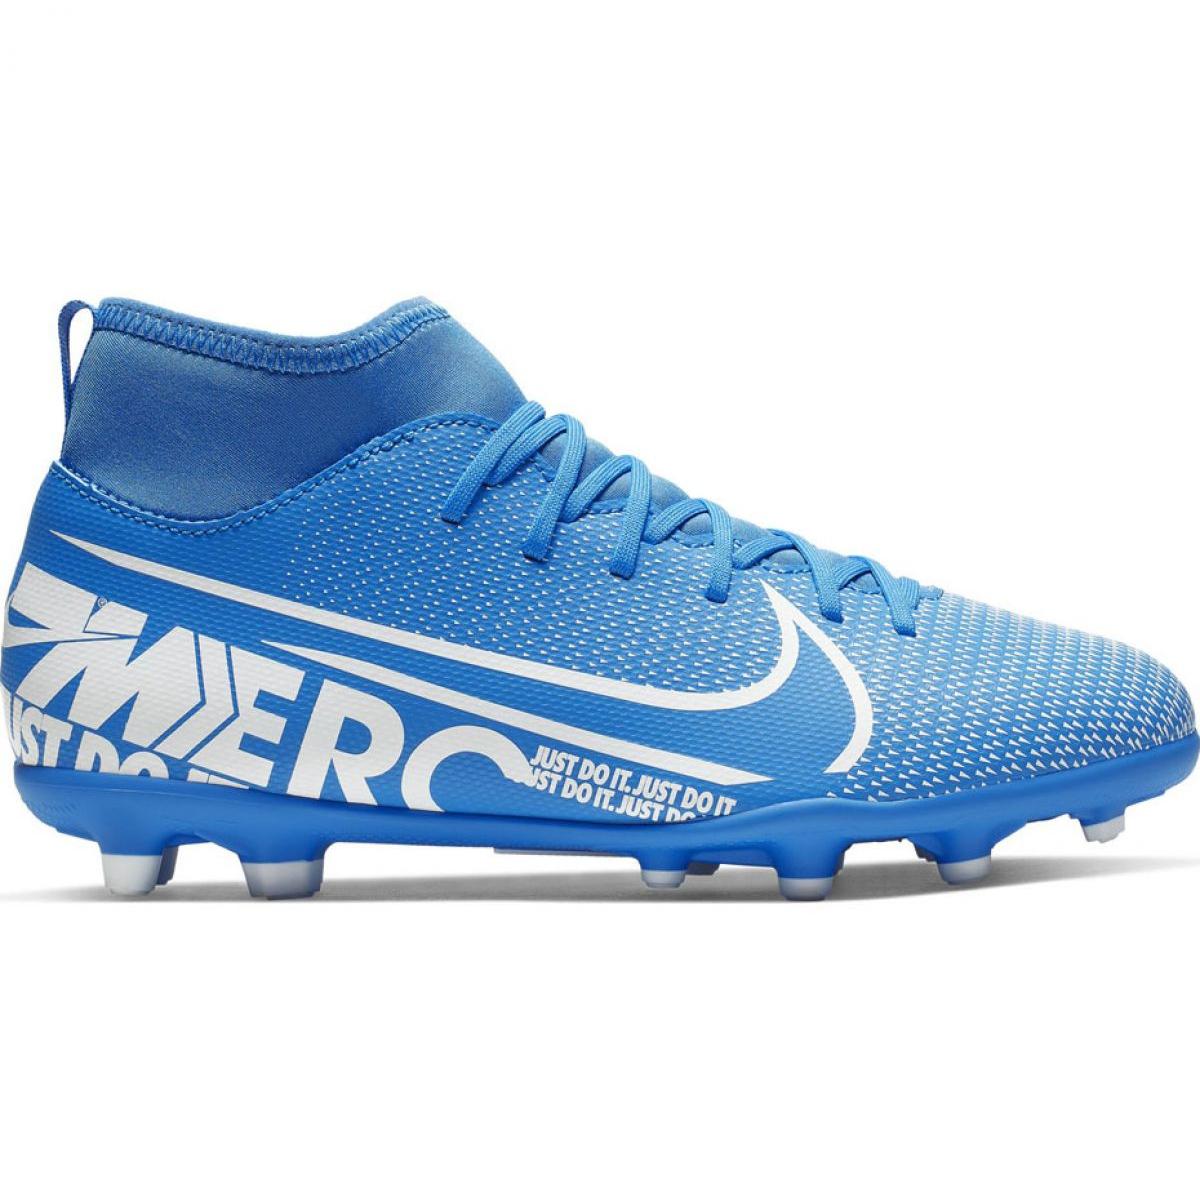 Sapatos de futebol Nike Mercurial Superfly 7 Clube FG MG Jr AT8150 414 azul azul